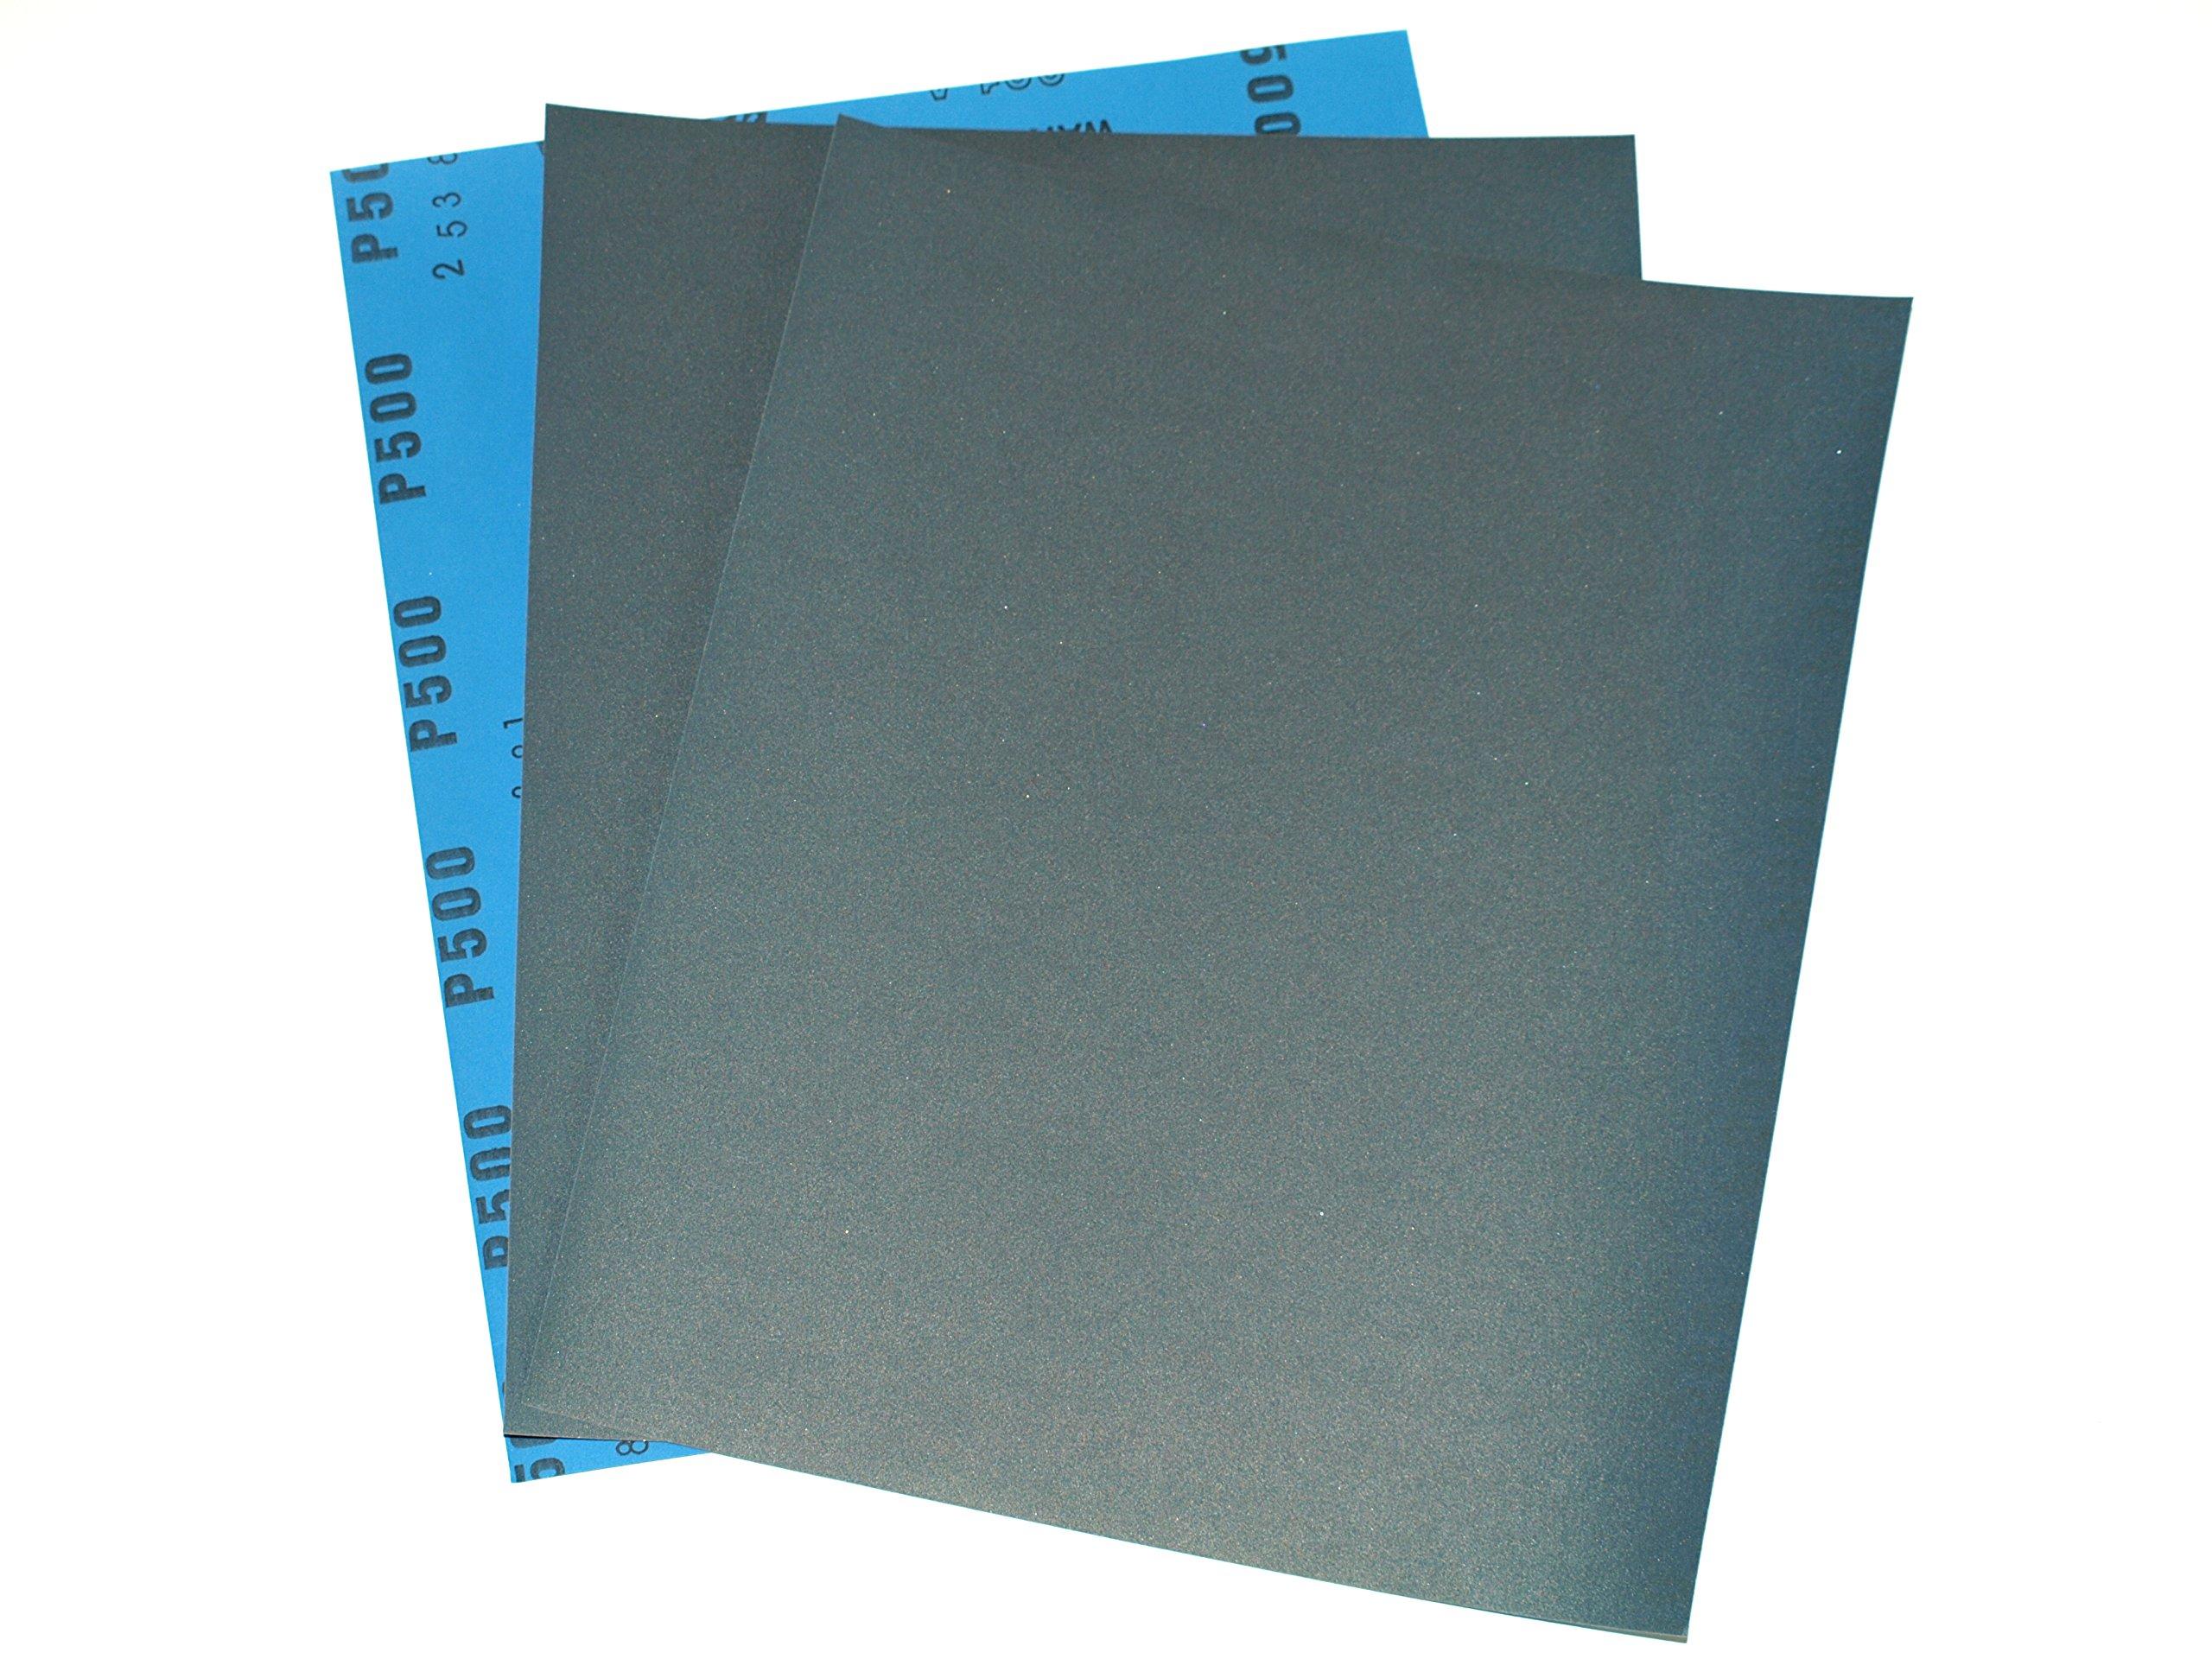 Wet and Dry Sandpaper 5000grit 5 sheets 230 x 280mm Waterproof Paper Highest Qua